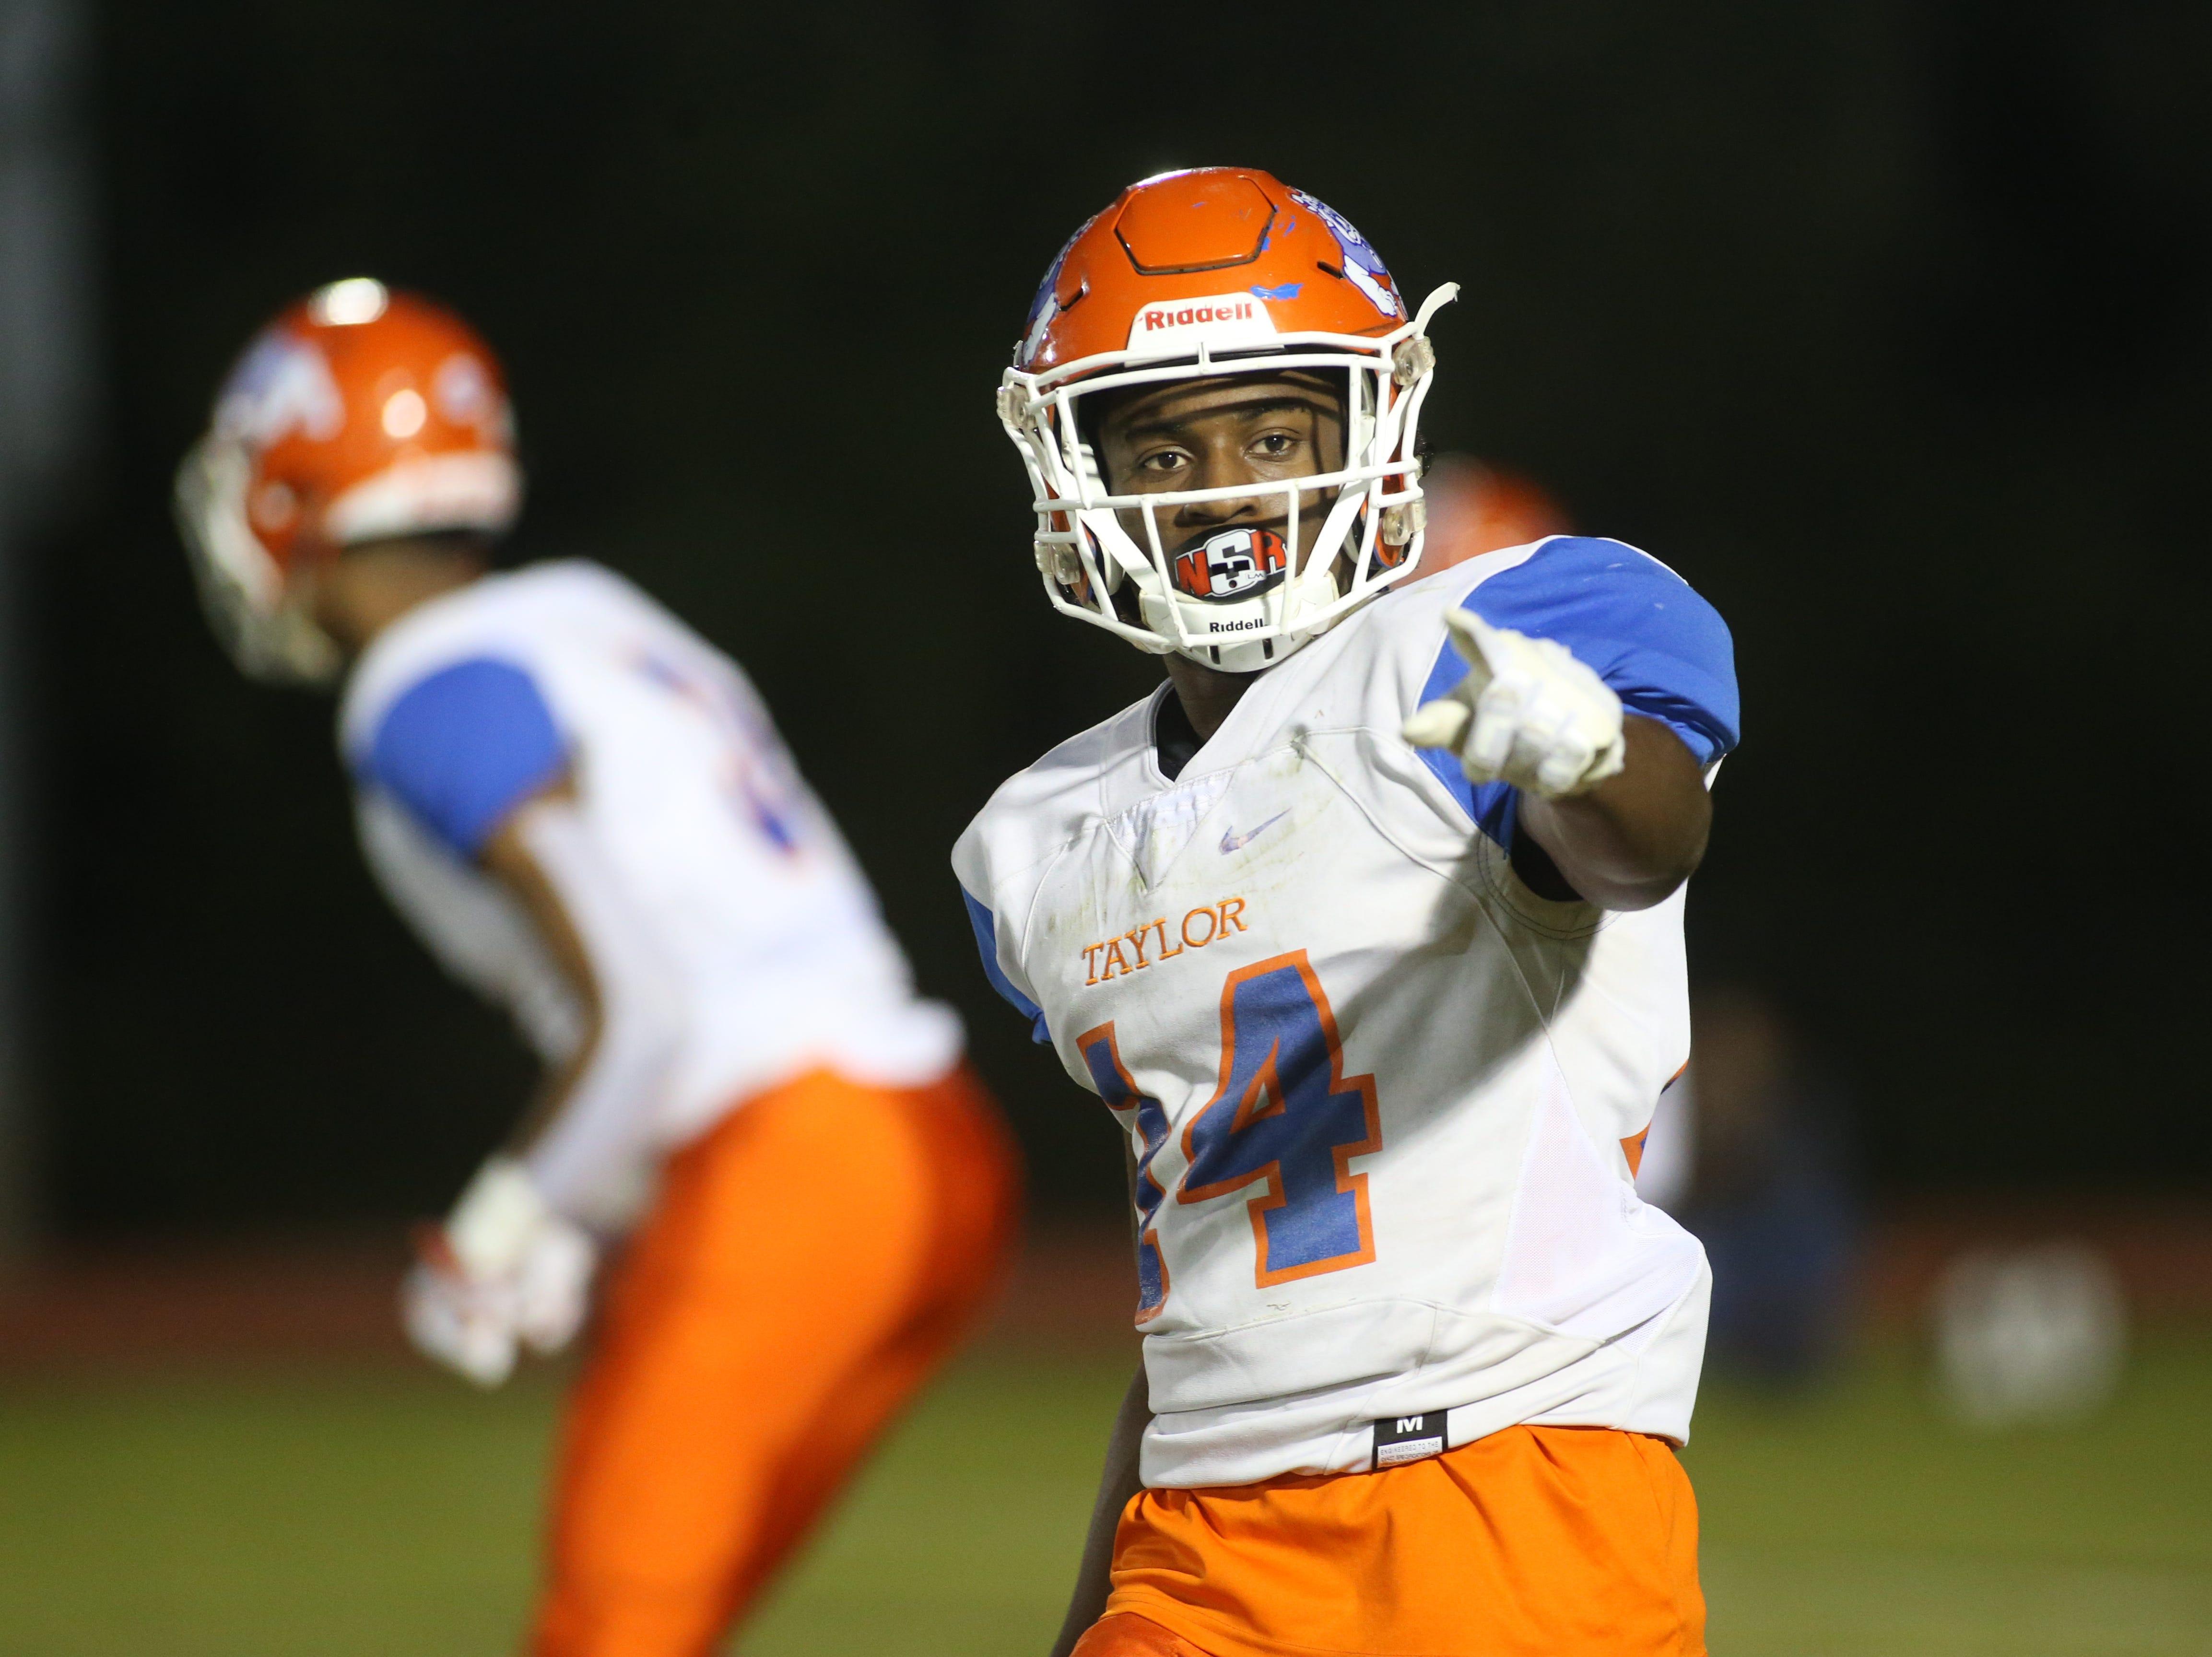 Taylor County Bulldog wide receiver Robert Glanton (14) as the Taylor County Bulldogs play the Florida High Seminoles in a Region 1-3A final on Friday, Nov. 23, 2018.